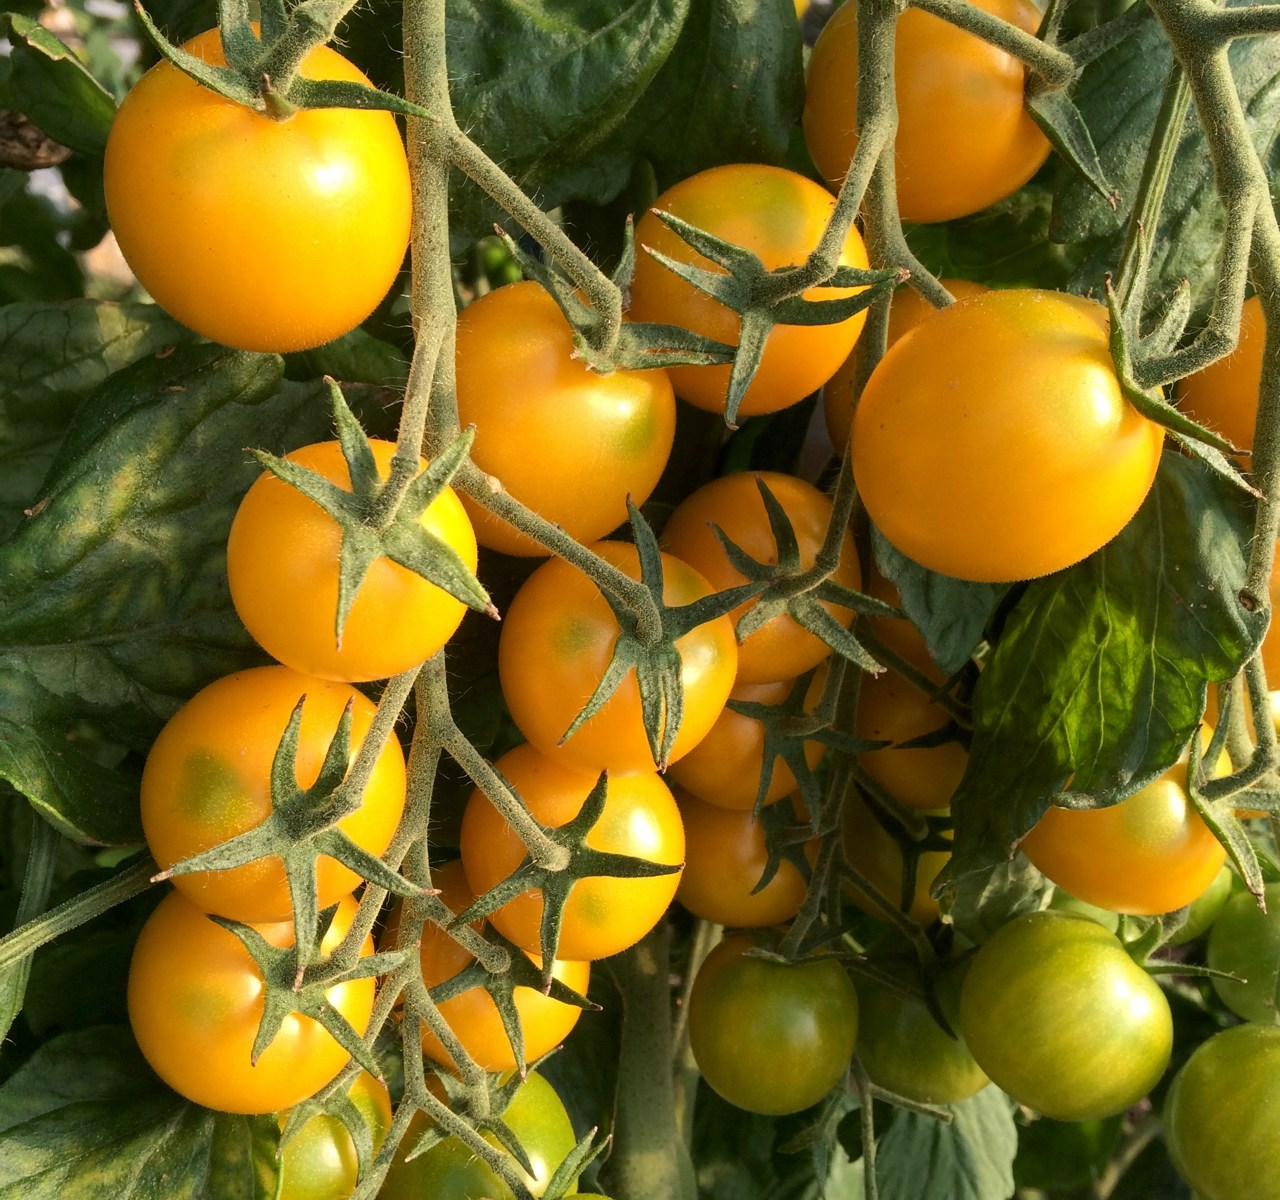 Yellow cherry tomatoes fresh produce Wiarton